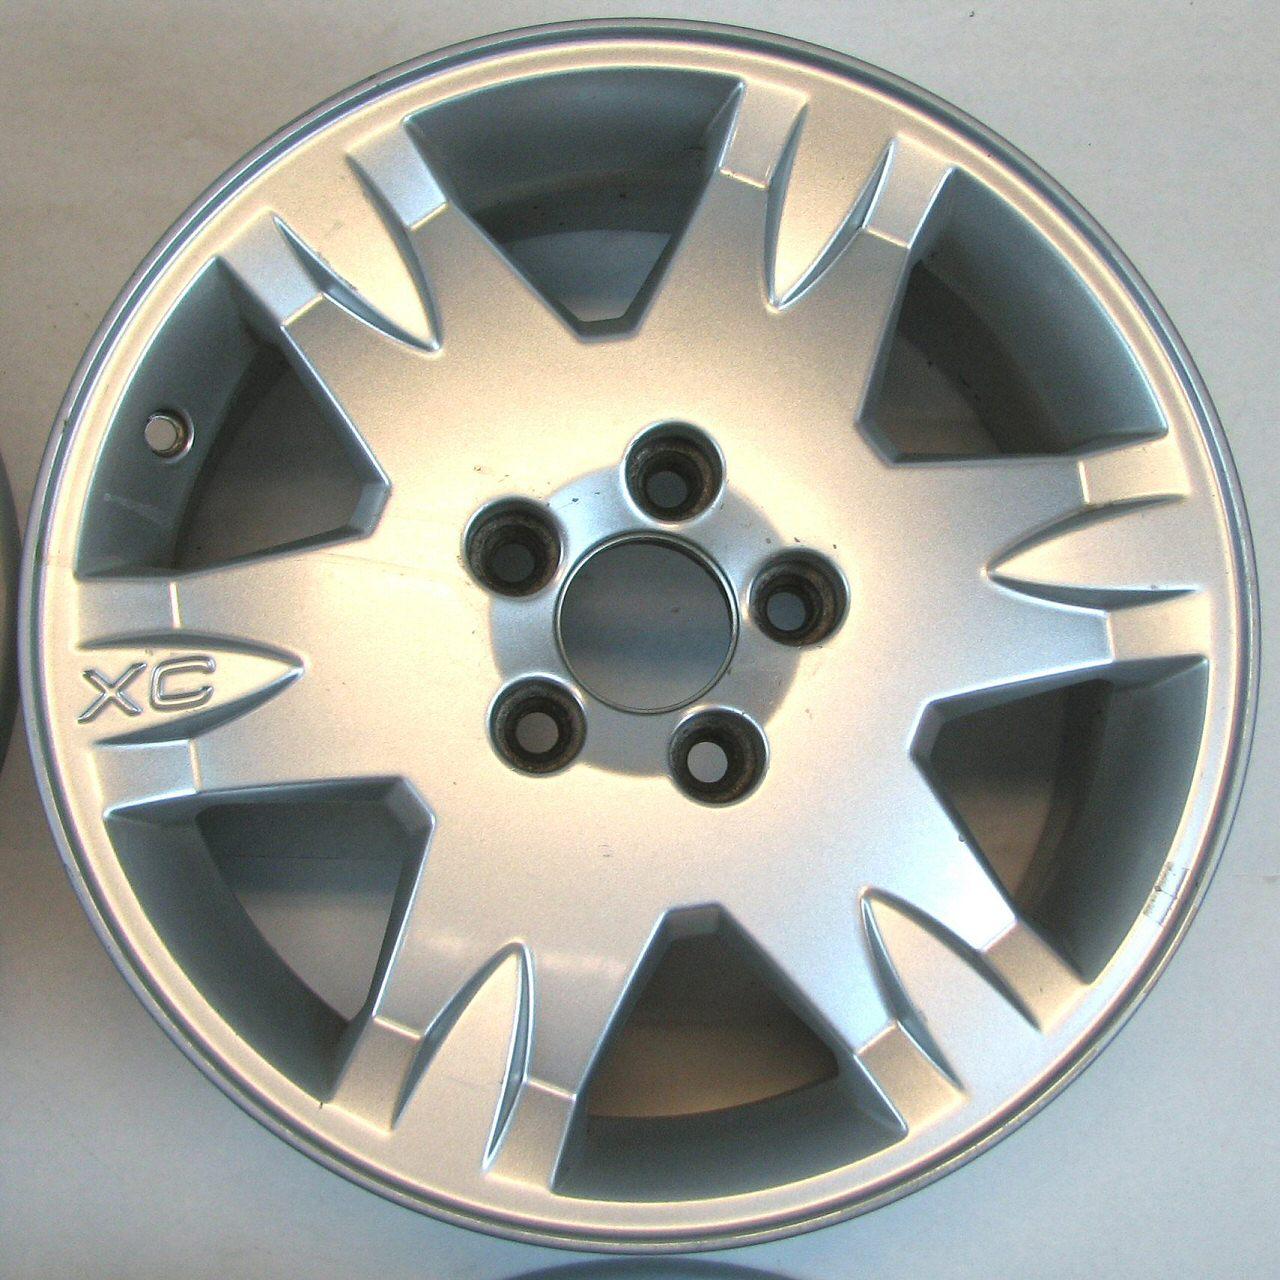 Set of 4 Volvo 16x7 Erinus Alloy Rims XC Wheels for XC70 V70 S80 S60 01 09